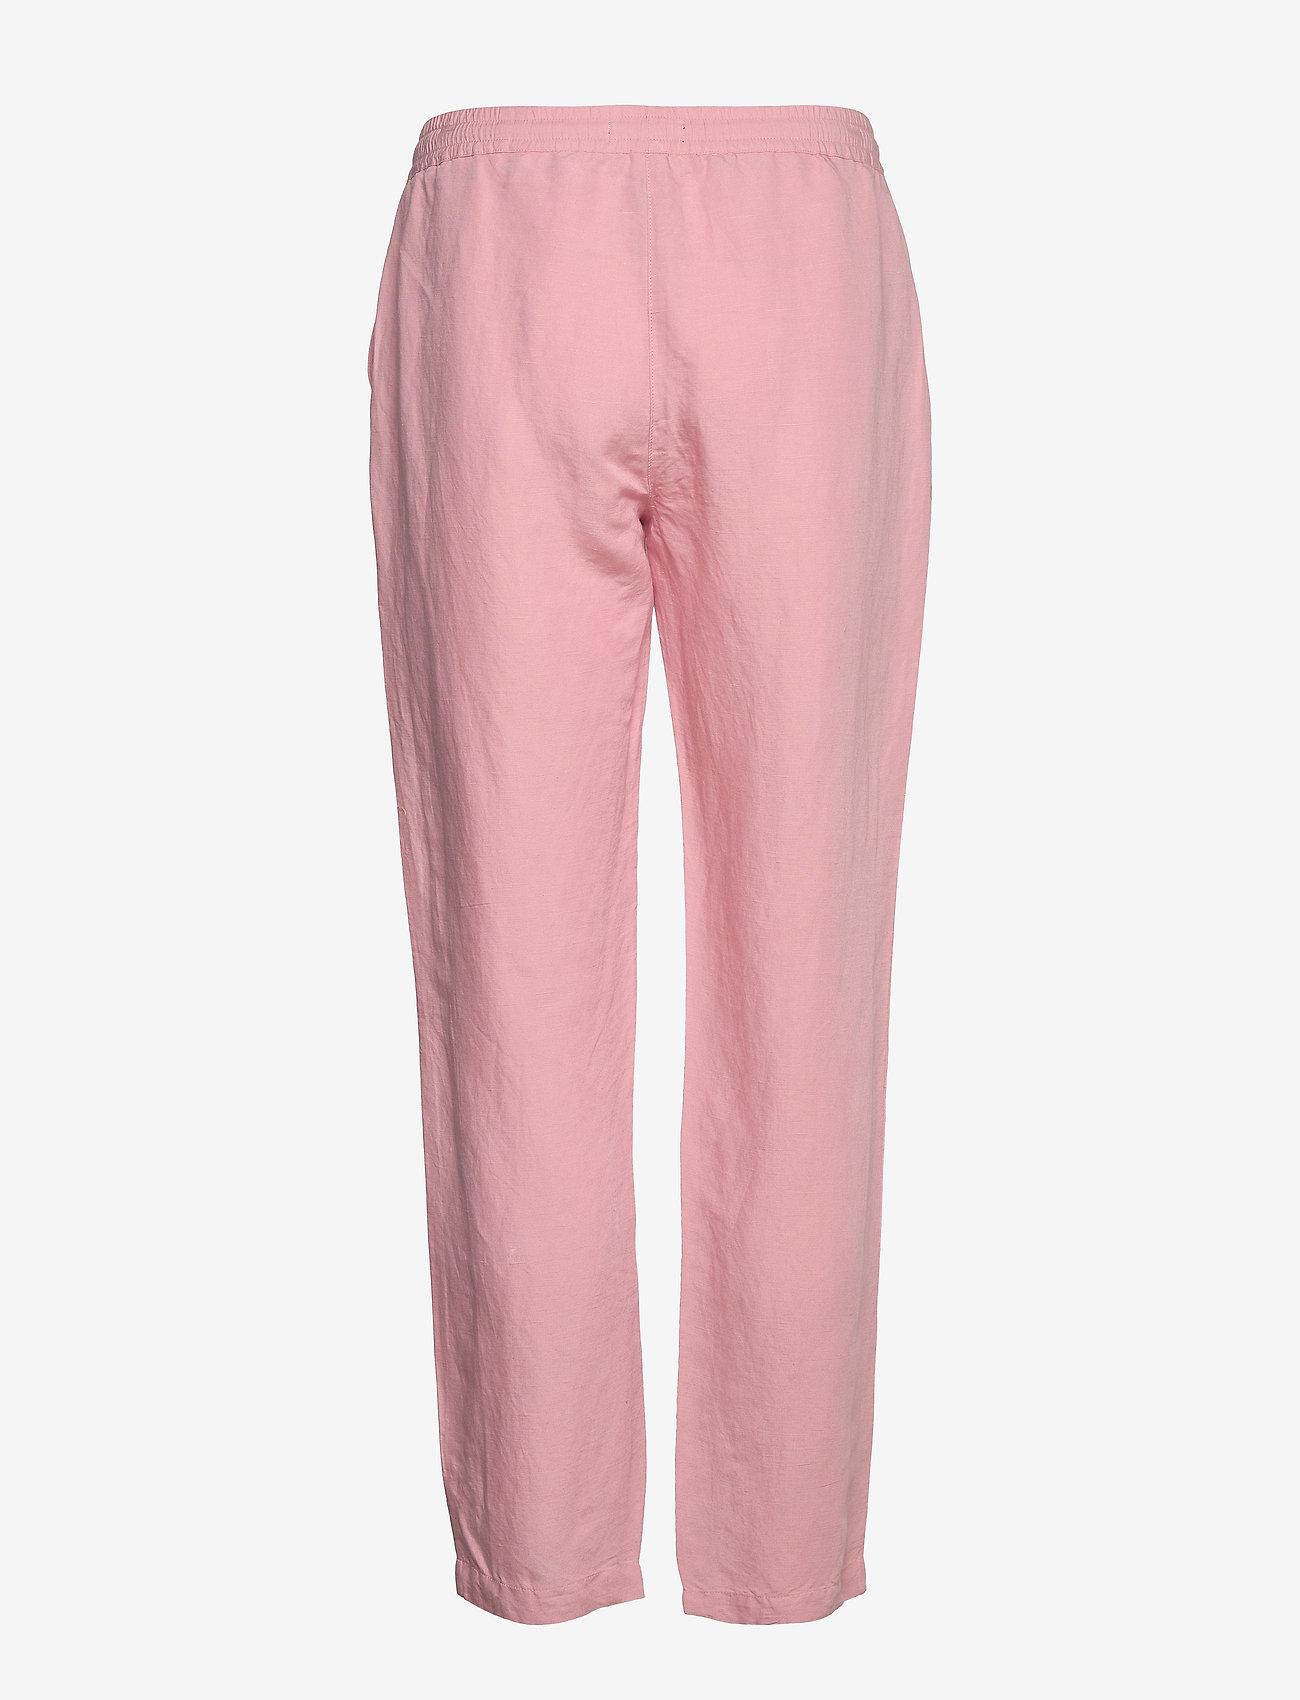 Gant - D2. SUMMER LINEN PULL-ON PANT - pantalons droits - summer rose